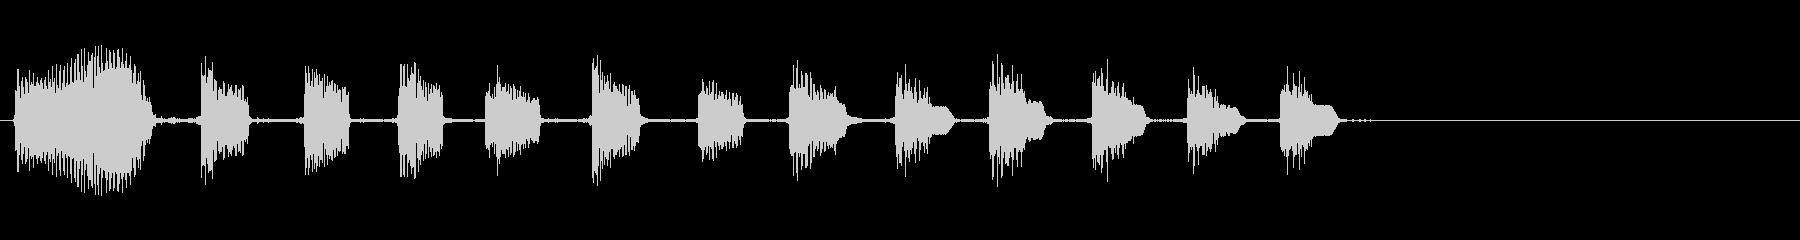 STEEL GUITAR:笑いアク...の未再生の波形